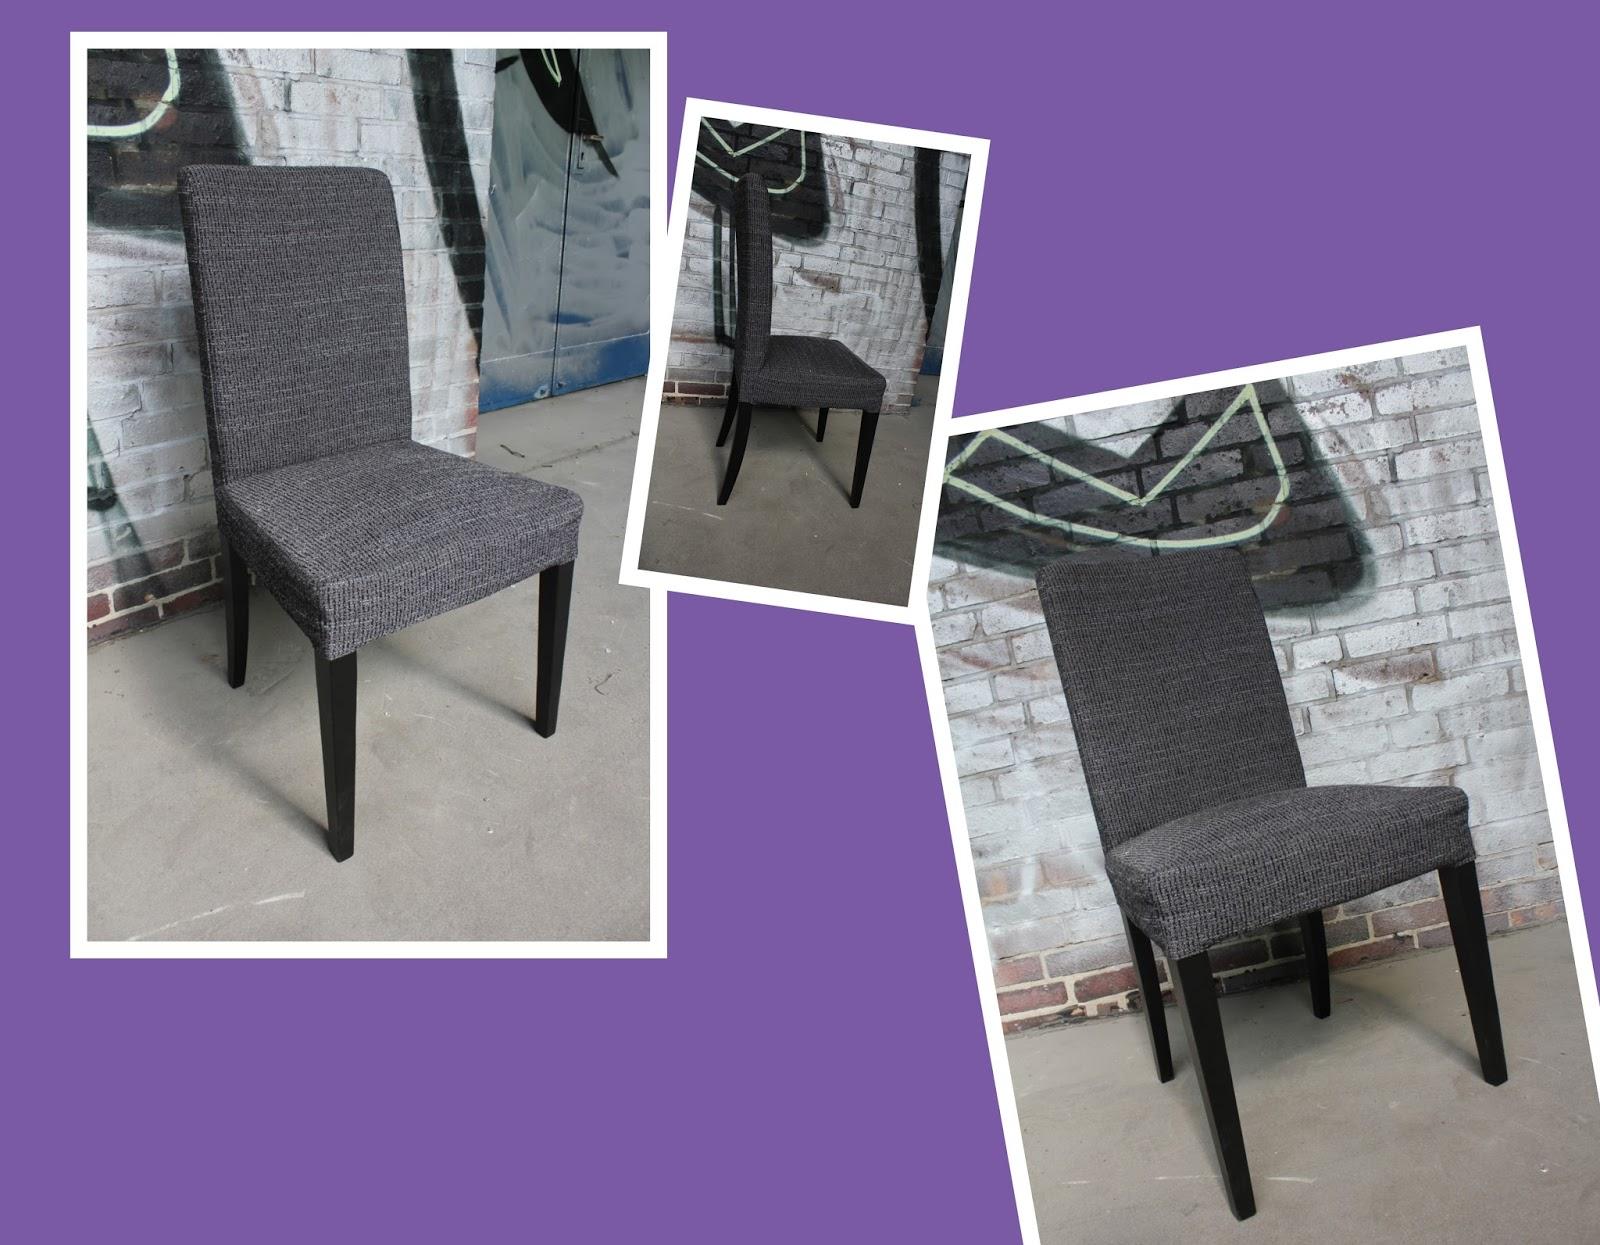 preishalle24 news 8x ikea stuhl gebrauchtm bel berlin. Black Bedroom Furniture Sets. Home Design Ideas